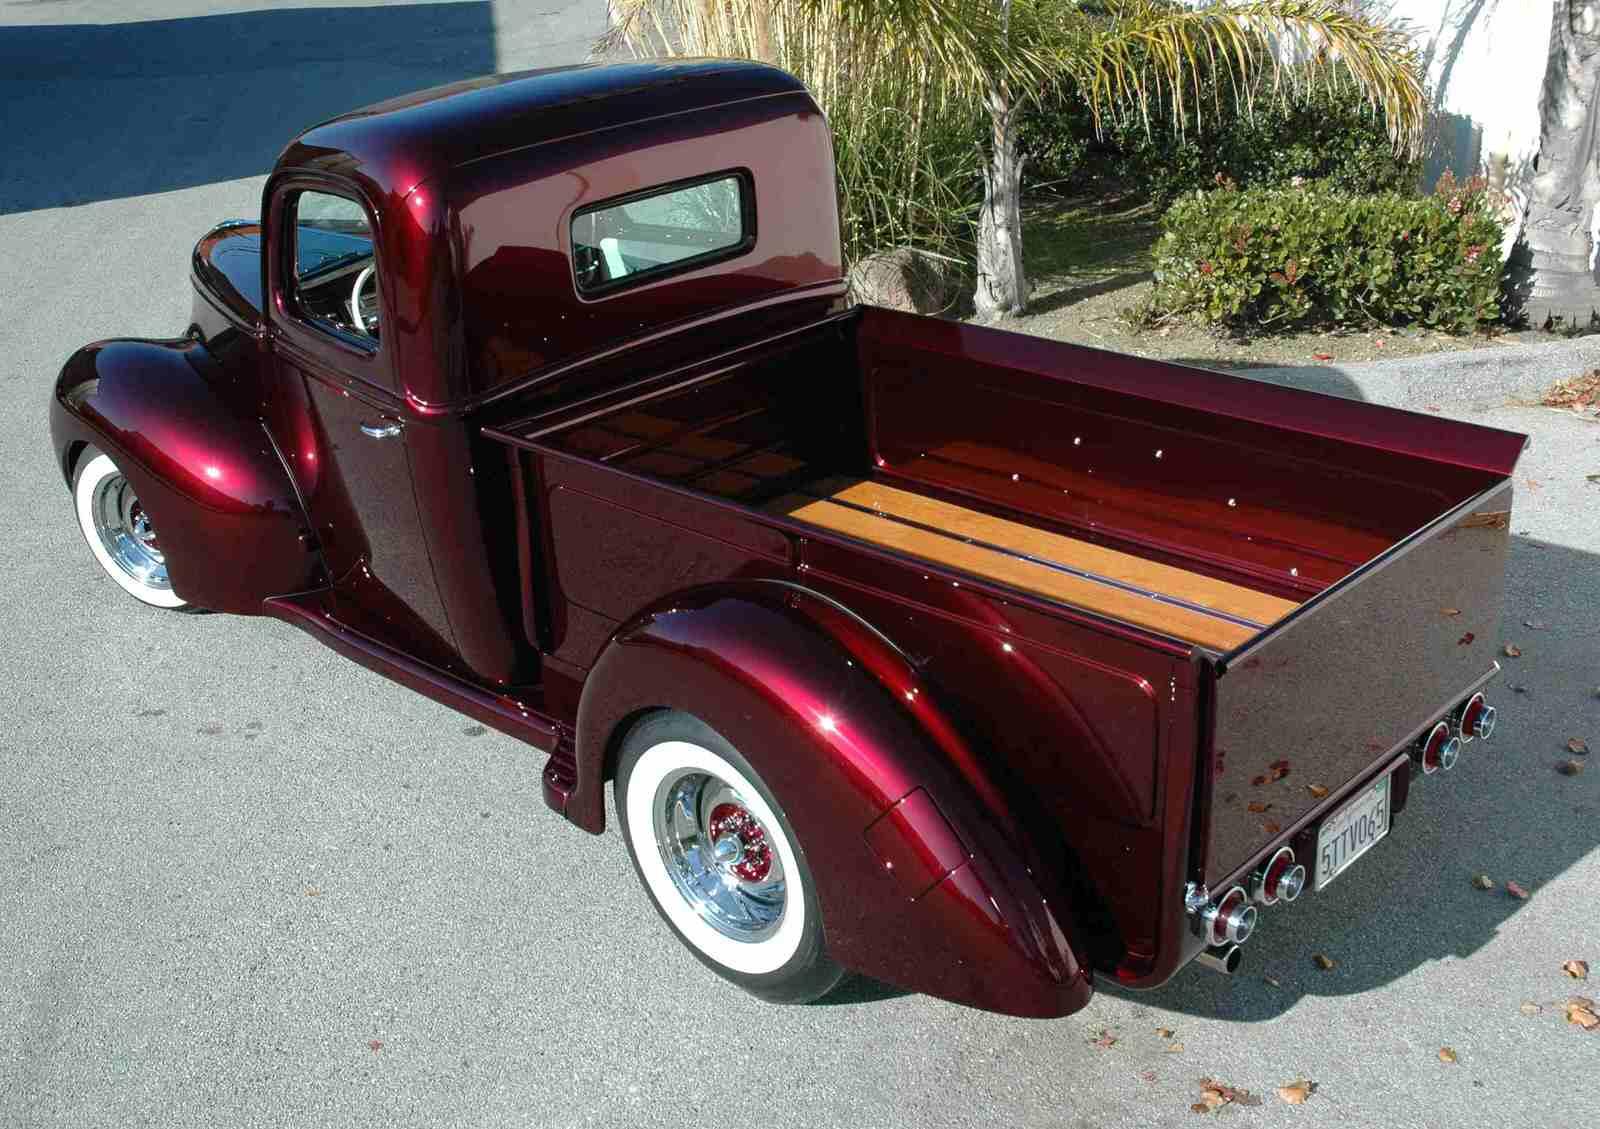 Dave Pozzi 1941 Ford Pickup (Lepesh Pickup) - South City Rod & Custom - Photo by Pat Ganahl